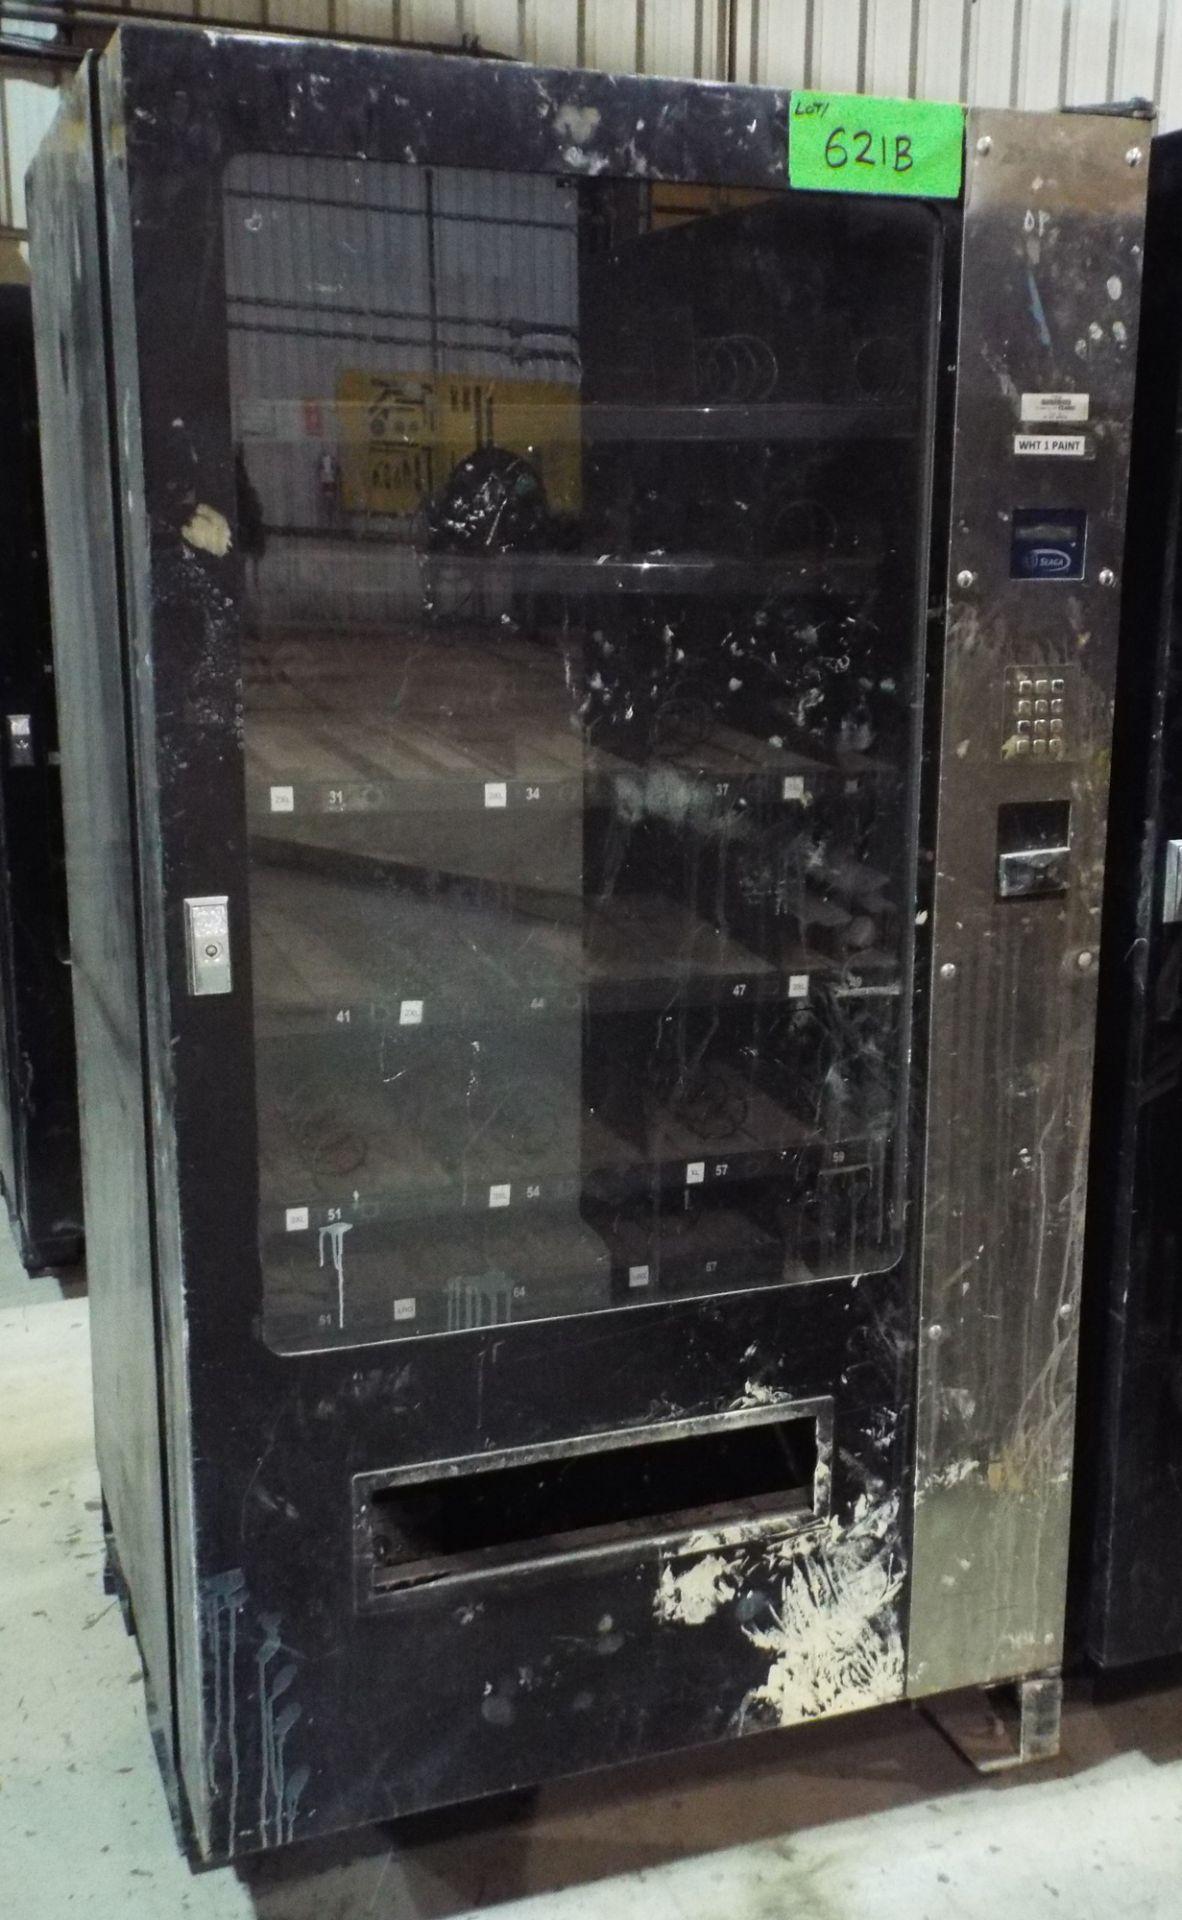 Lot 621B - SEAGA IQ640 INVENTORY CONTROL PARTS & PERISHABLES VENDING MACHINE, S/N: SK0311500613